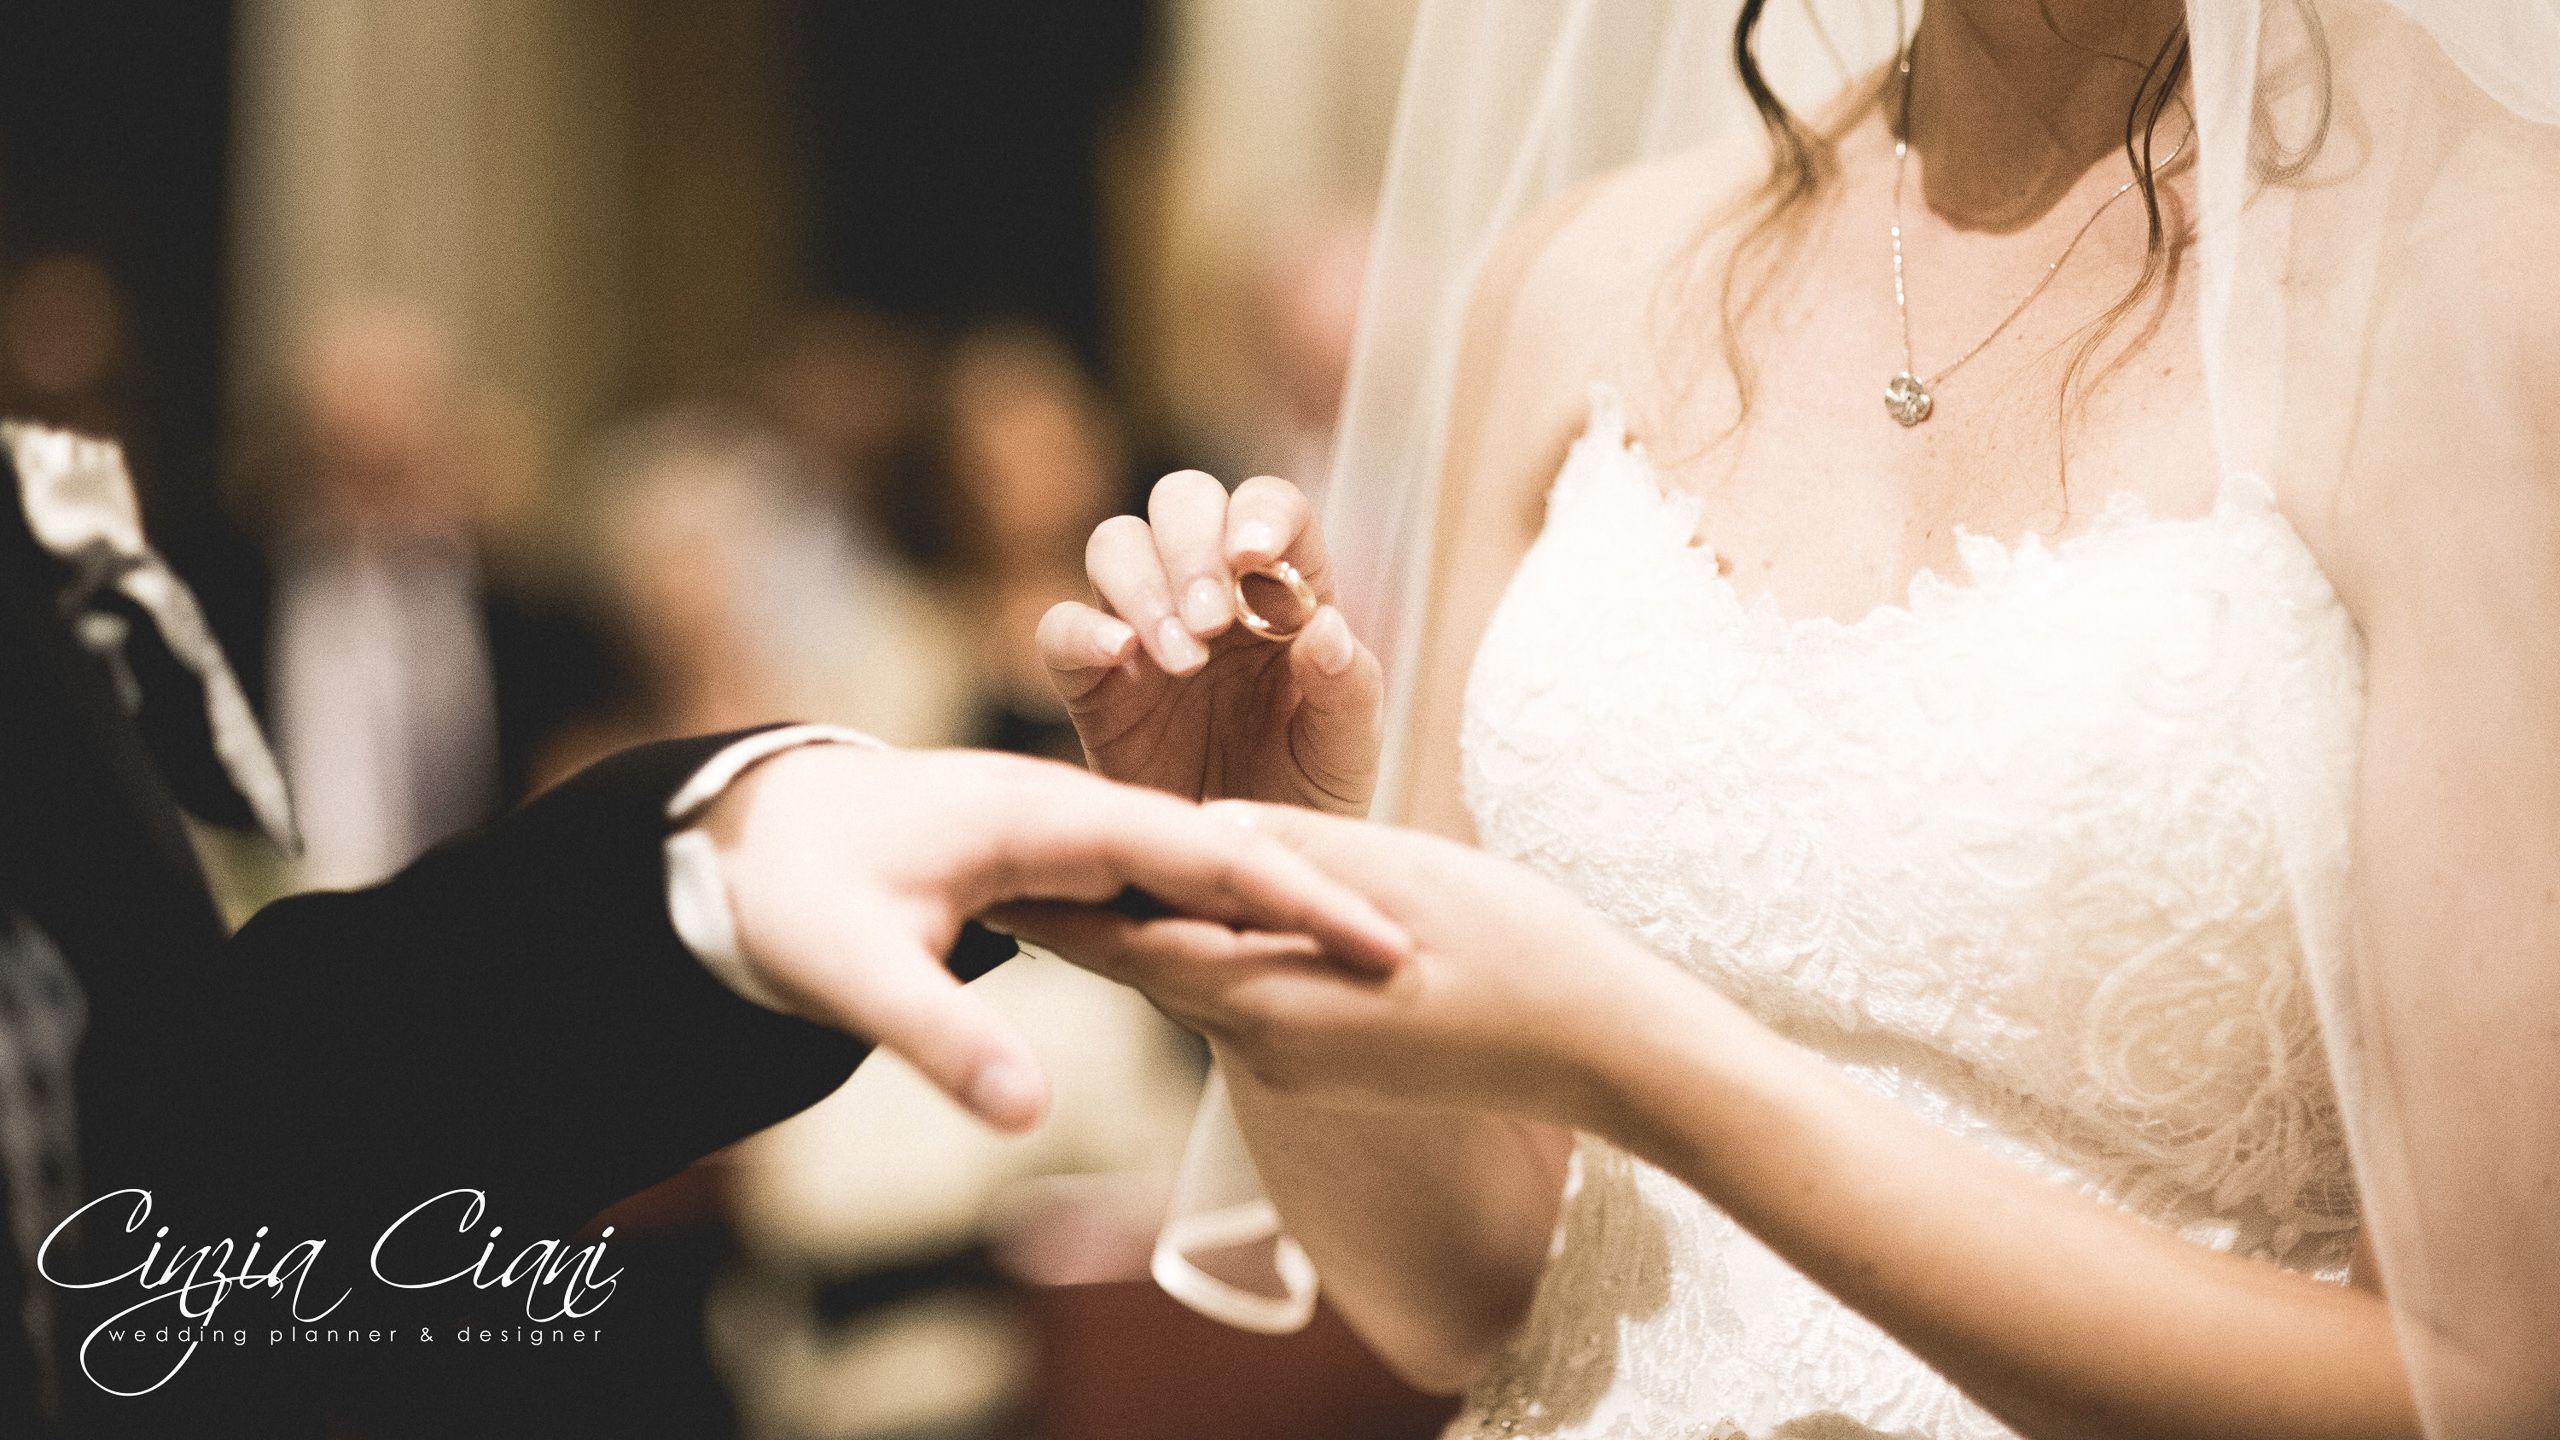 IMG-1309--Wedding-Planner-Designer-Rome-cinzia-ciani-weddings-events